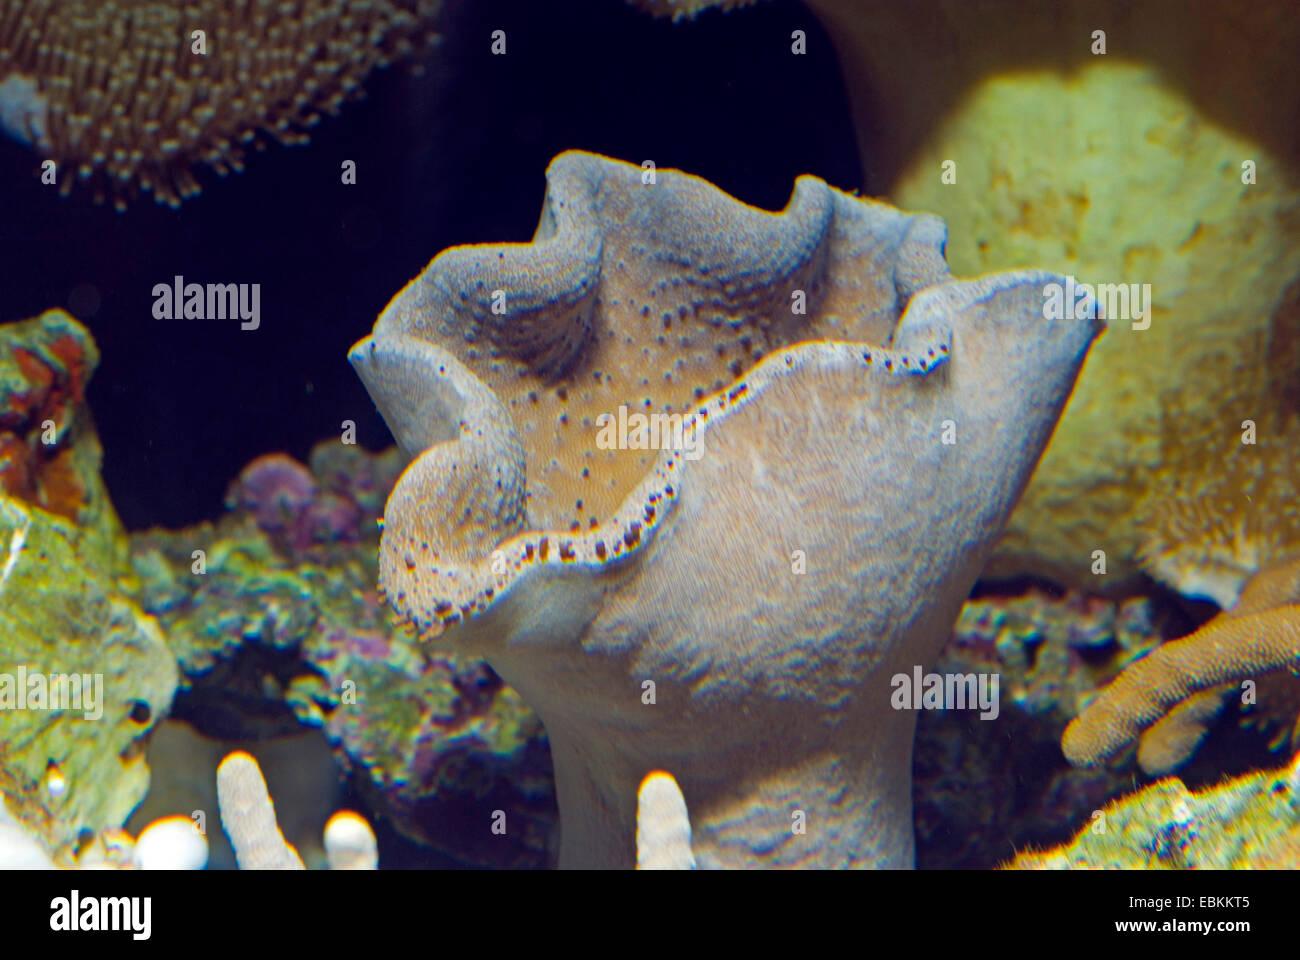 Sarcophyton aquarium stockfotos sarcophyton aquarium bilder alamy - Aquarium hintergrund ausdrucken ...